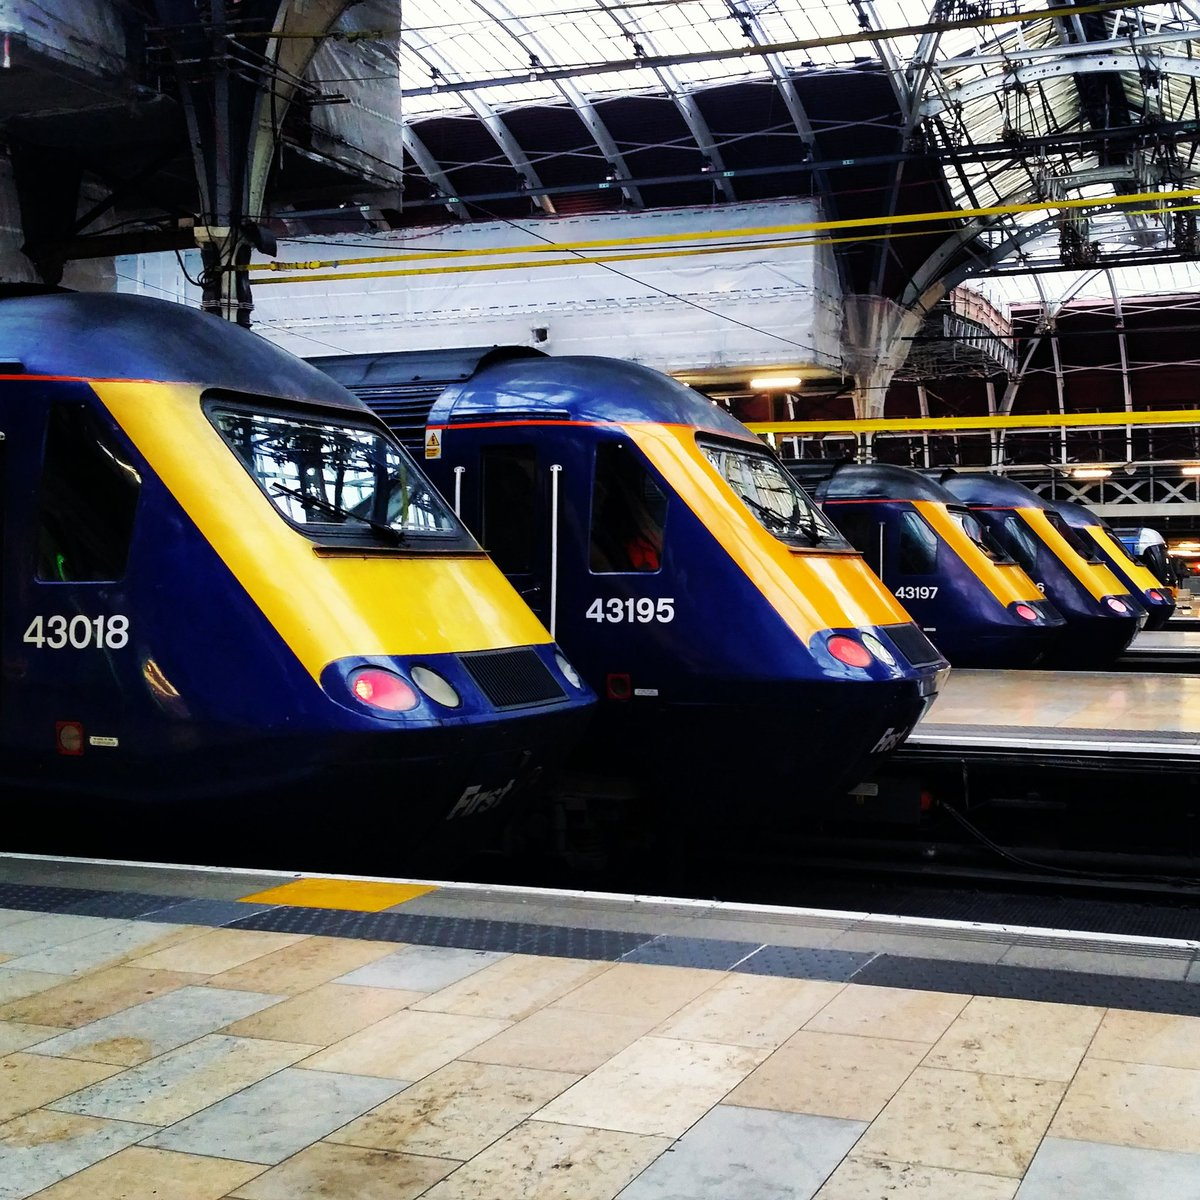 @networkrail Line up at Paddington. #dailypick https://t.co/aWtCNIJV2T